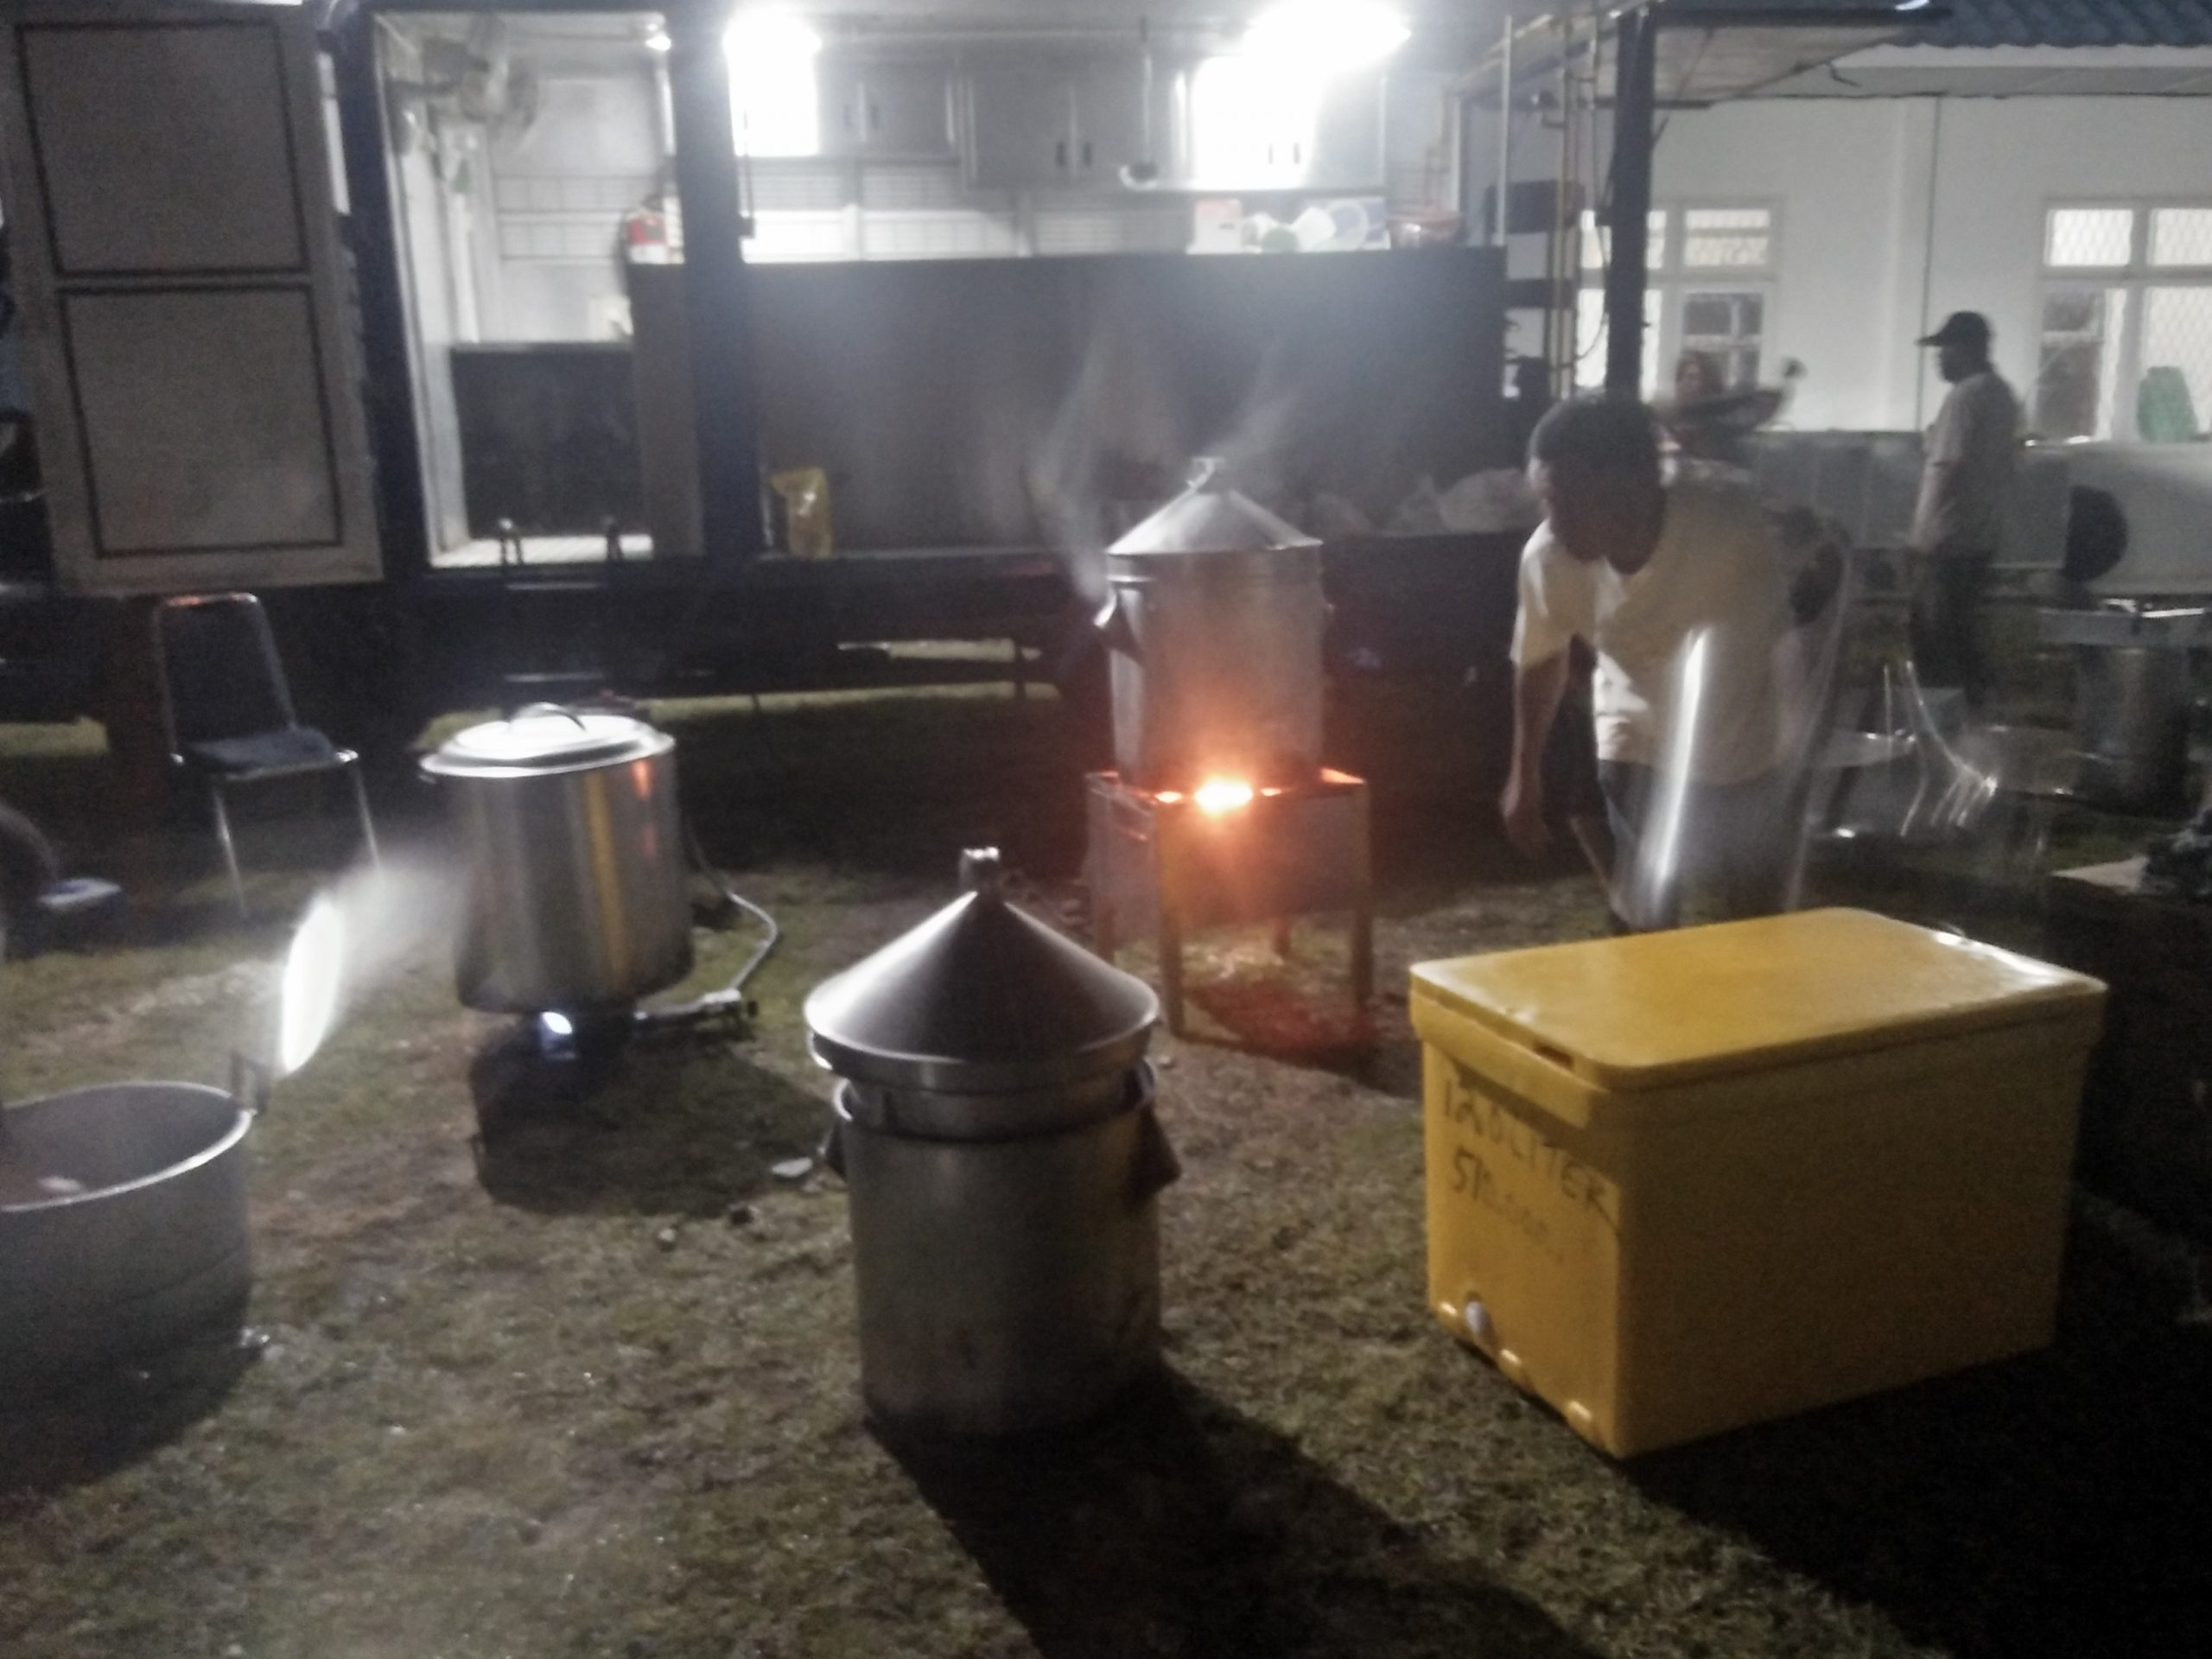 Petugas saat memasak nasi didapur umum Sihaporas Nauli. Foto: Rakyatsumut.com/Rommy